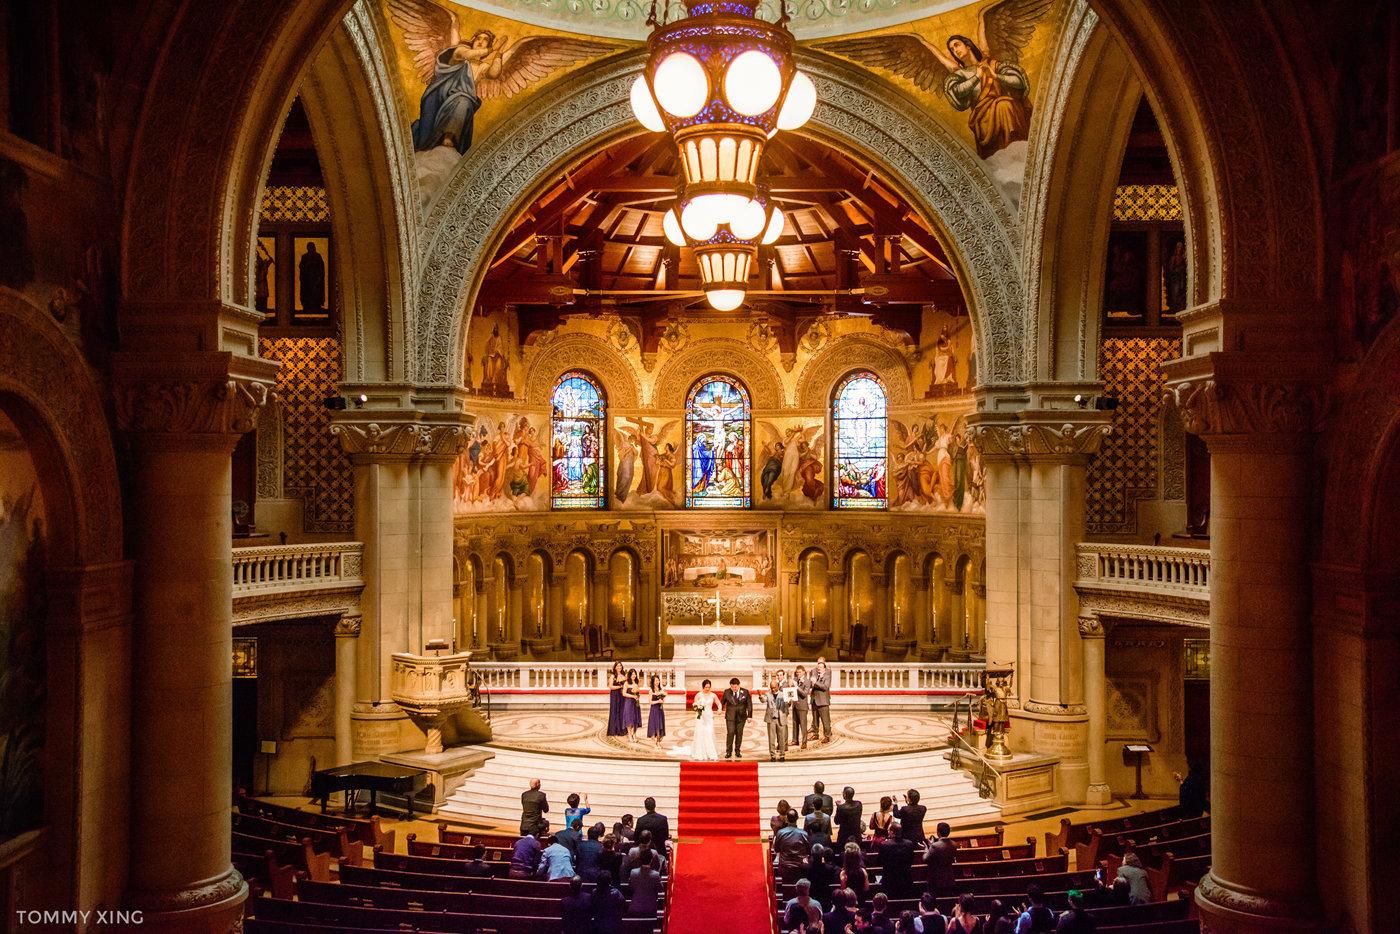 STANFORD MEMORIAL CHURCH WEDDING - Wenjie & Chengcheng - SAN FRANCISCO BAY AREA 斯坦福教堂婚礼跟拍 - 洛杉矶婚礼婚纱照摄影师 Tommy Xing Photography117.jpg